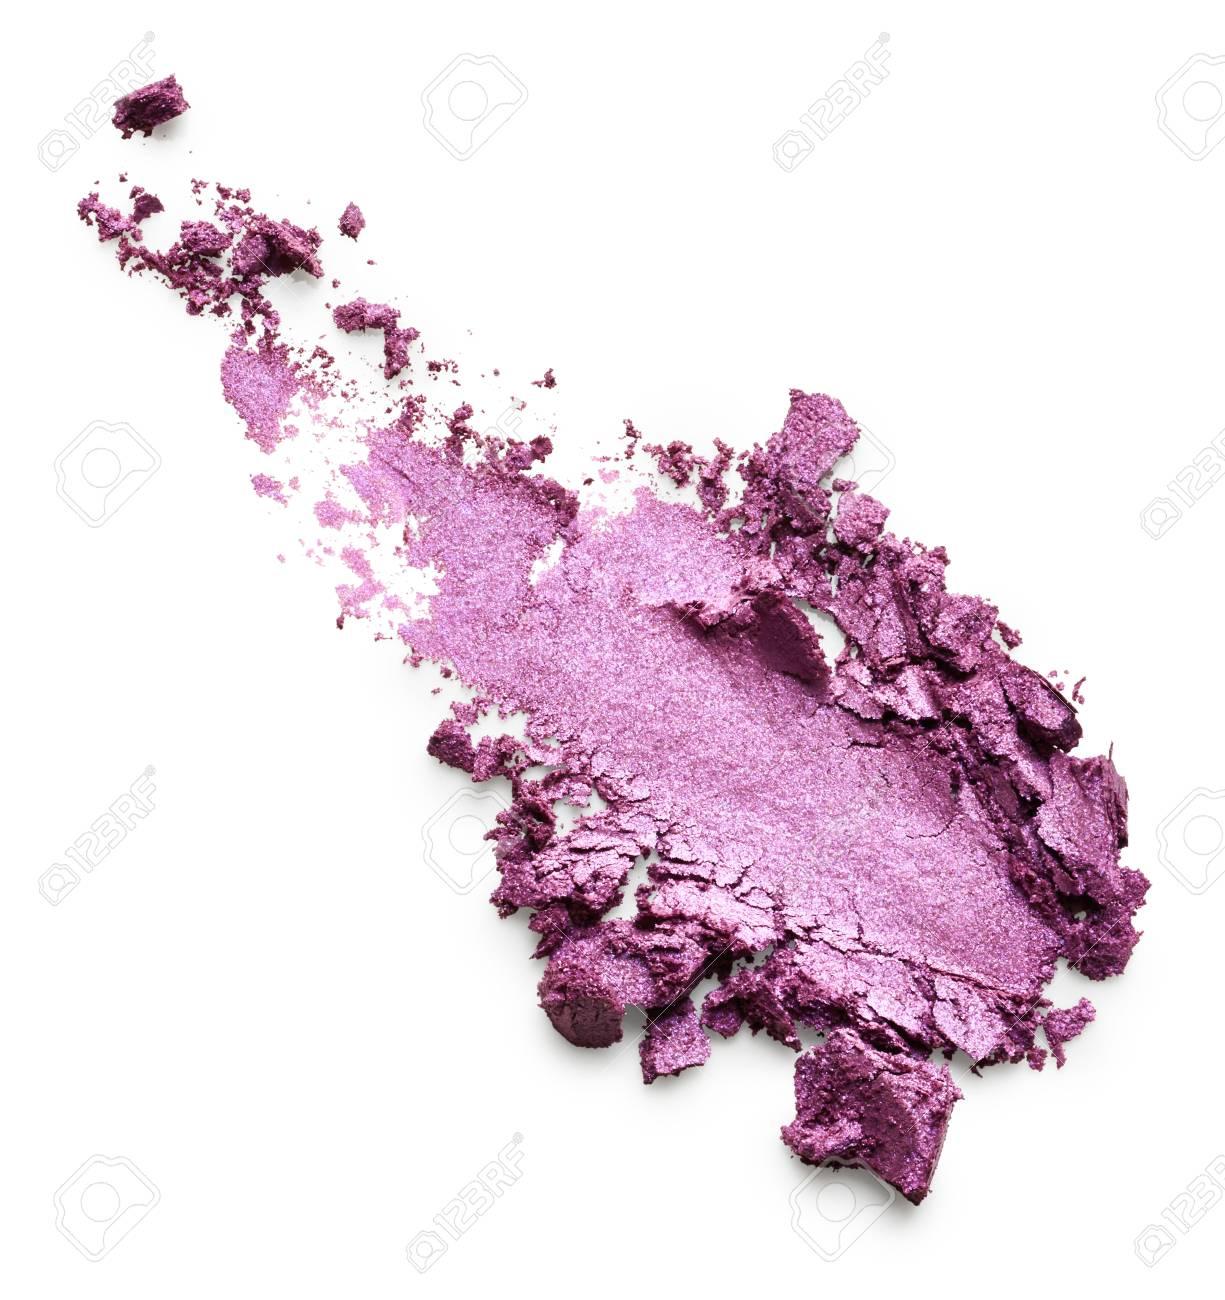 Purple eye shadow isolated on white background - 67391502